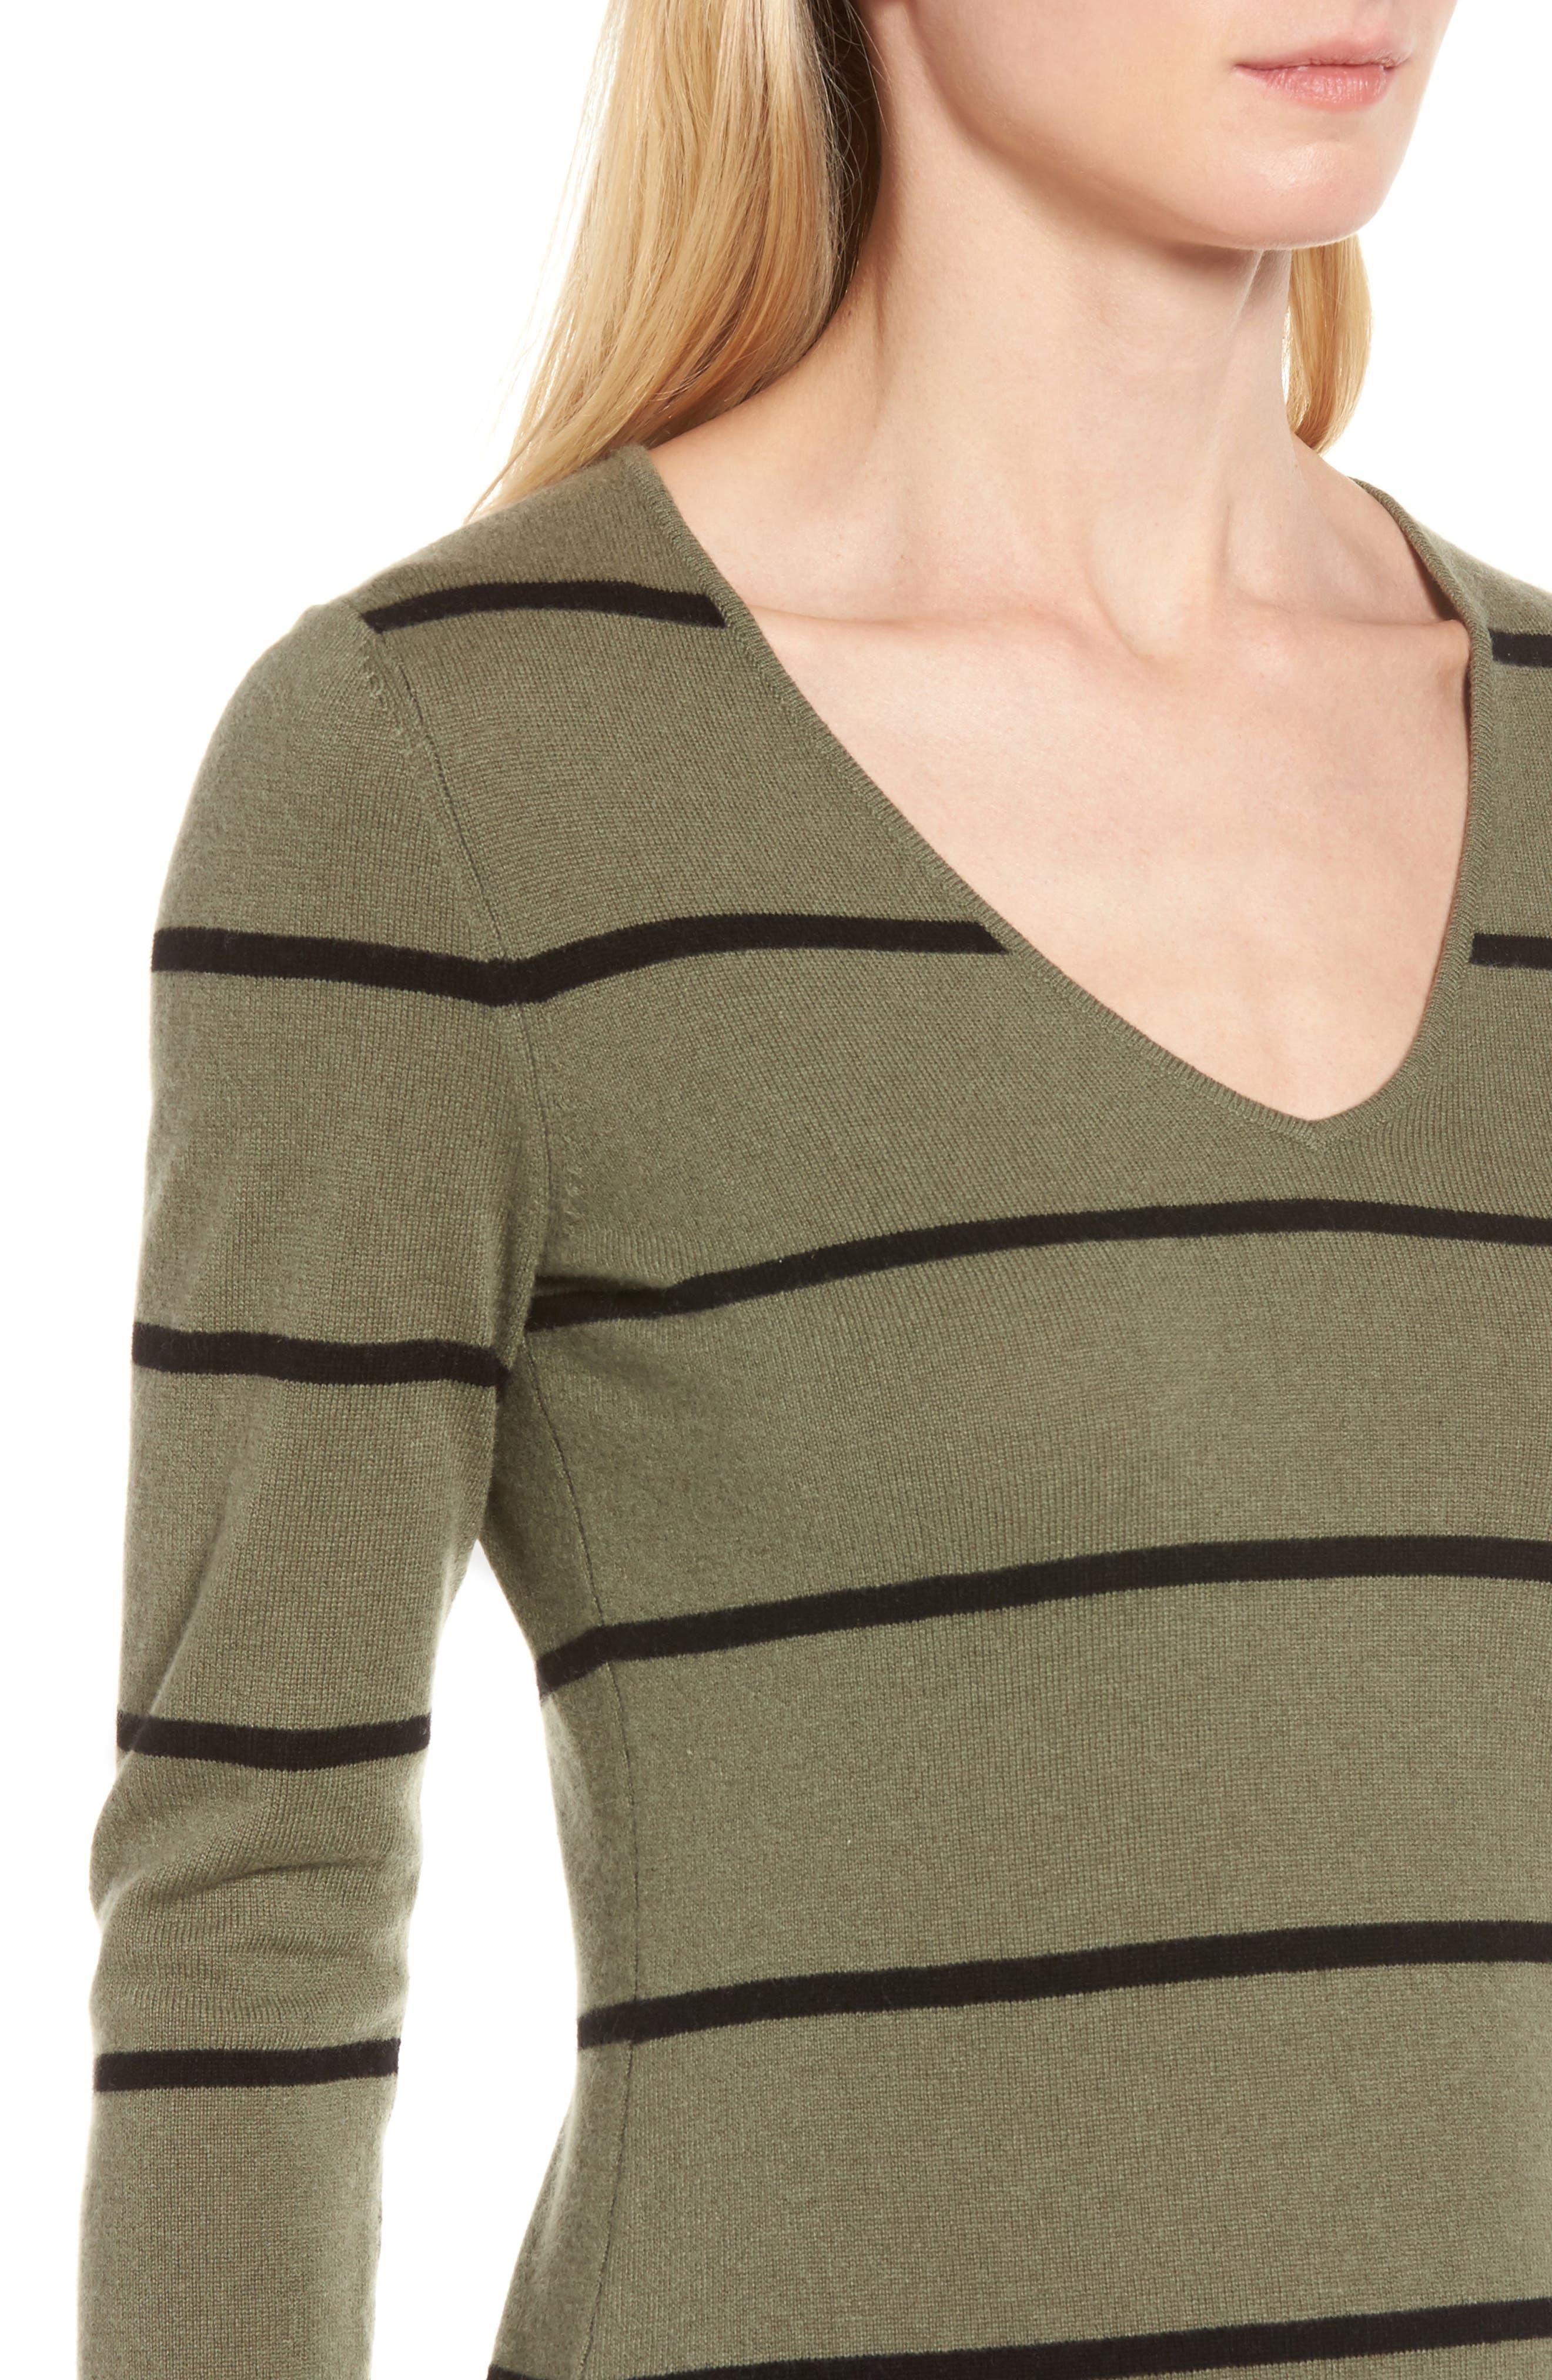 Stripe Cashmere Sweater,                             Alternate thumbnail 4, color,                             315